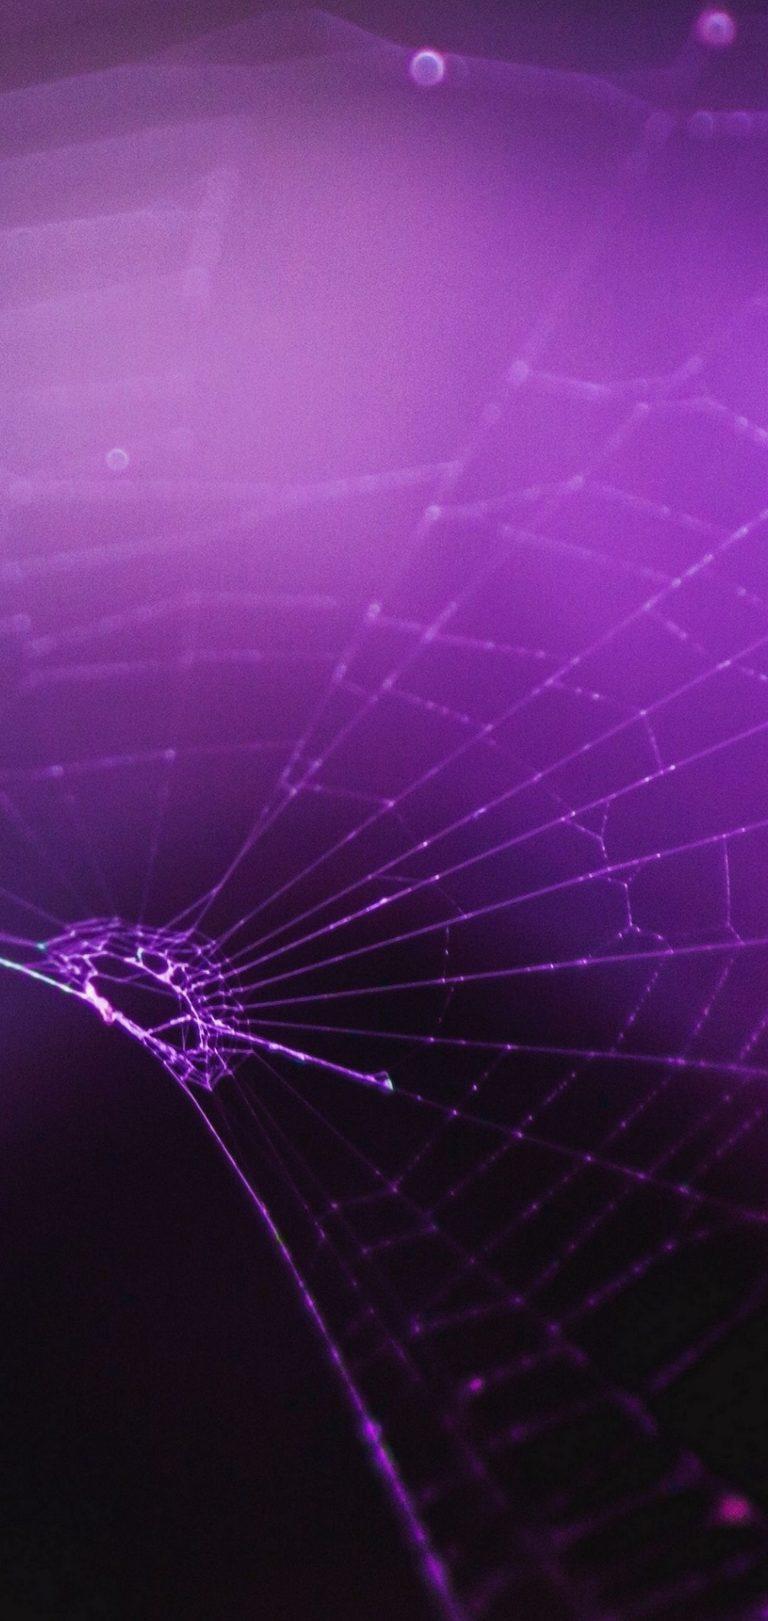 Macro Spider Purple Wallpaper 1440x3040 768x1621